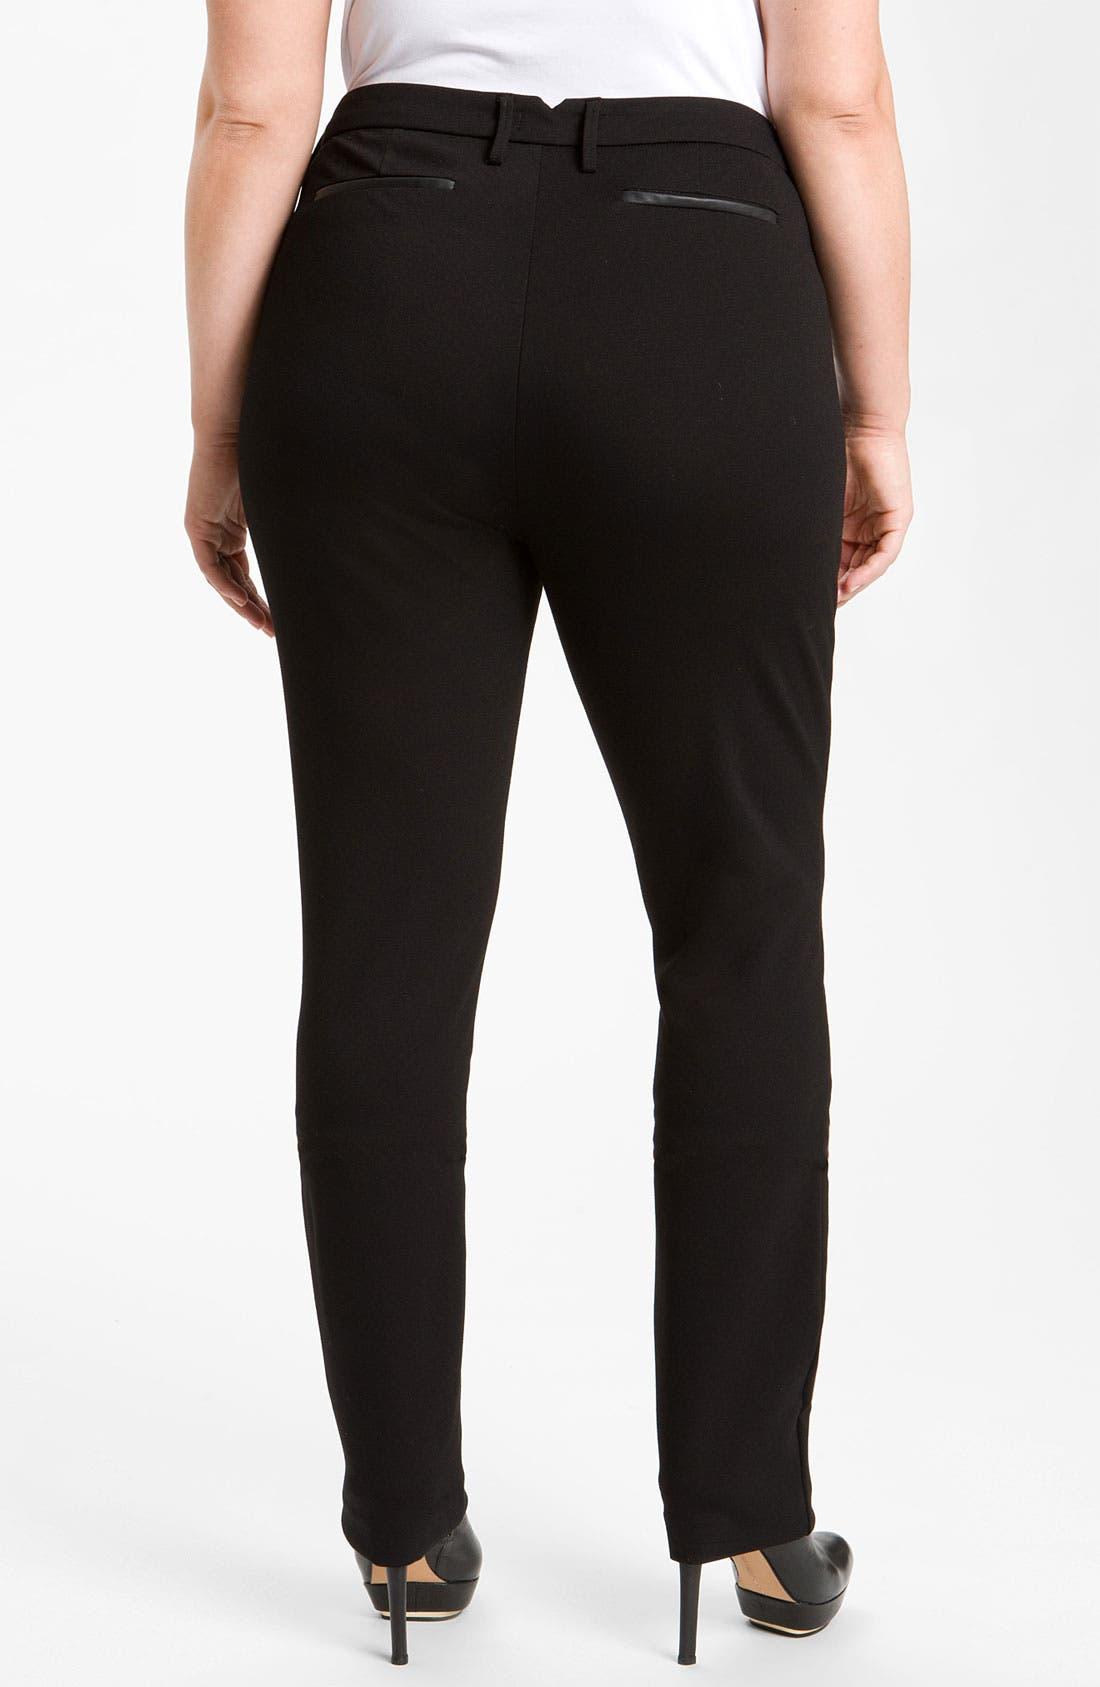 Main Image - NYDJ Stretch Ponte Knit Pants (Plus)